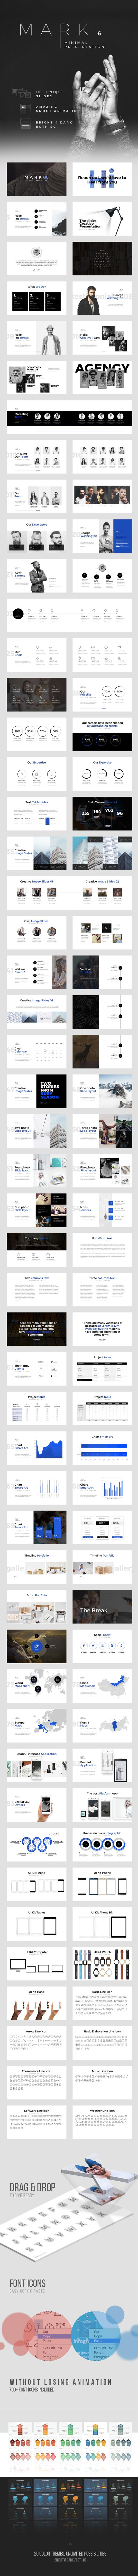 Mark06 - Minimal Keynote Template - Abstract Keynote Templates